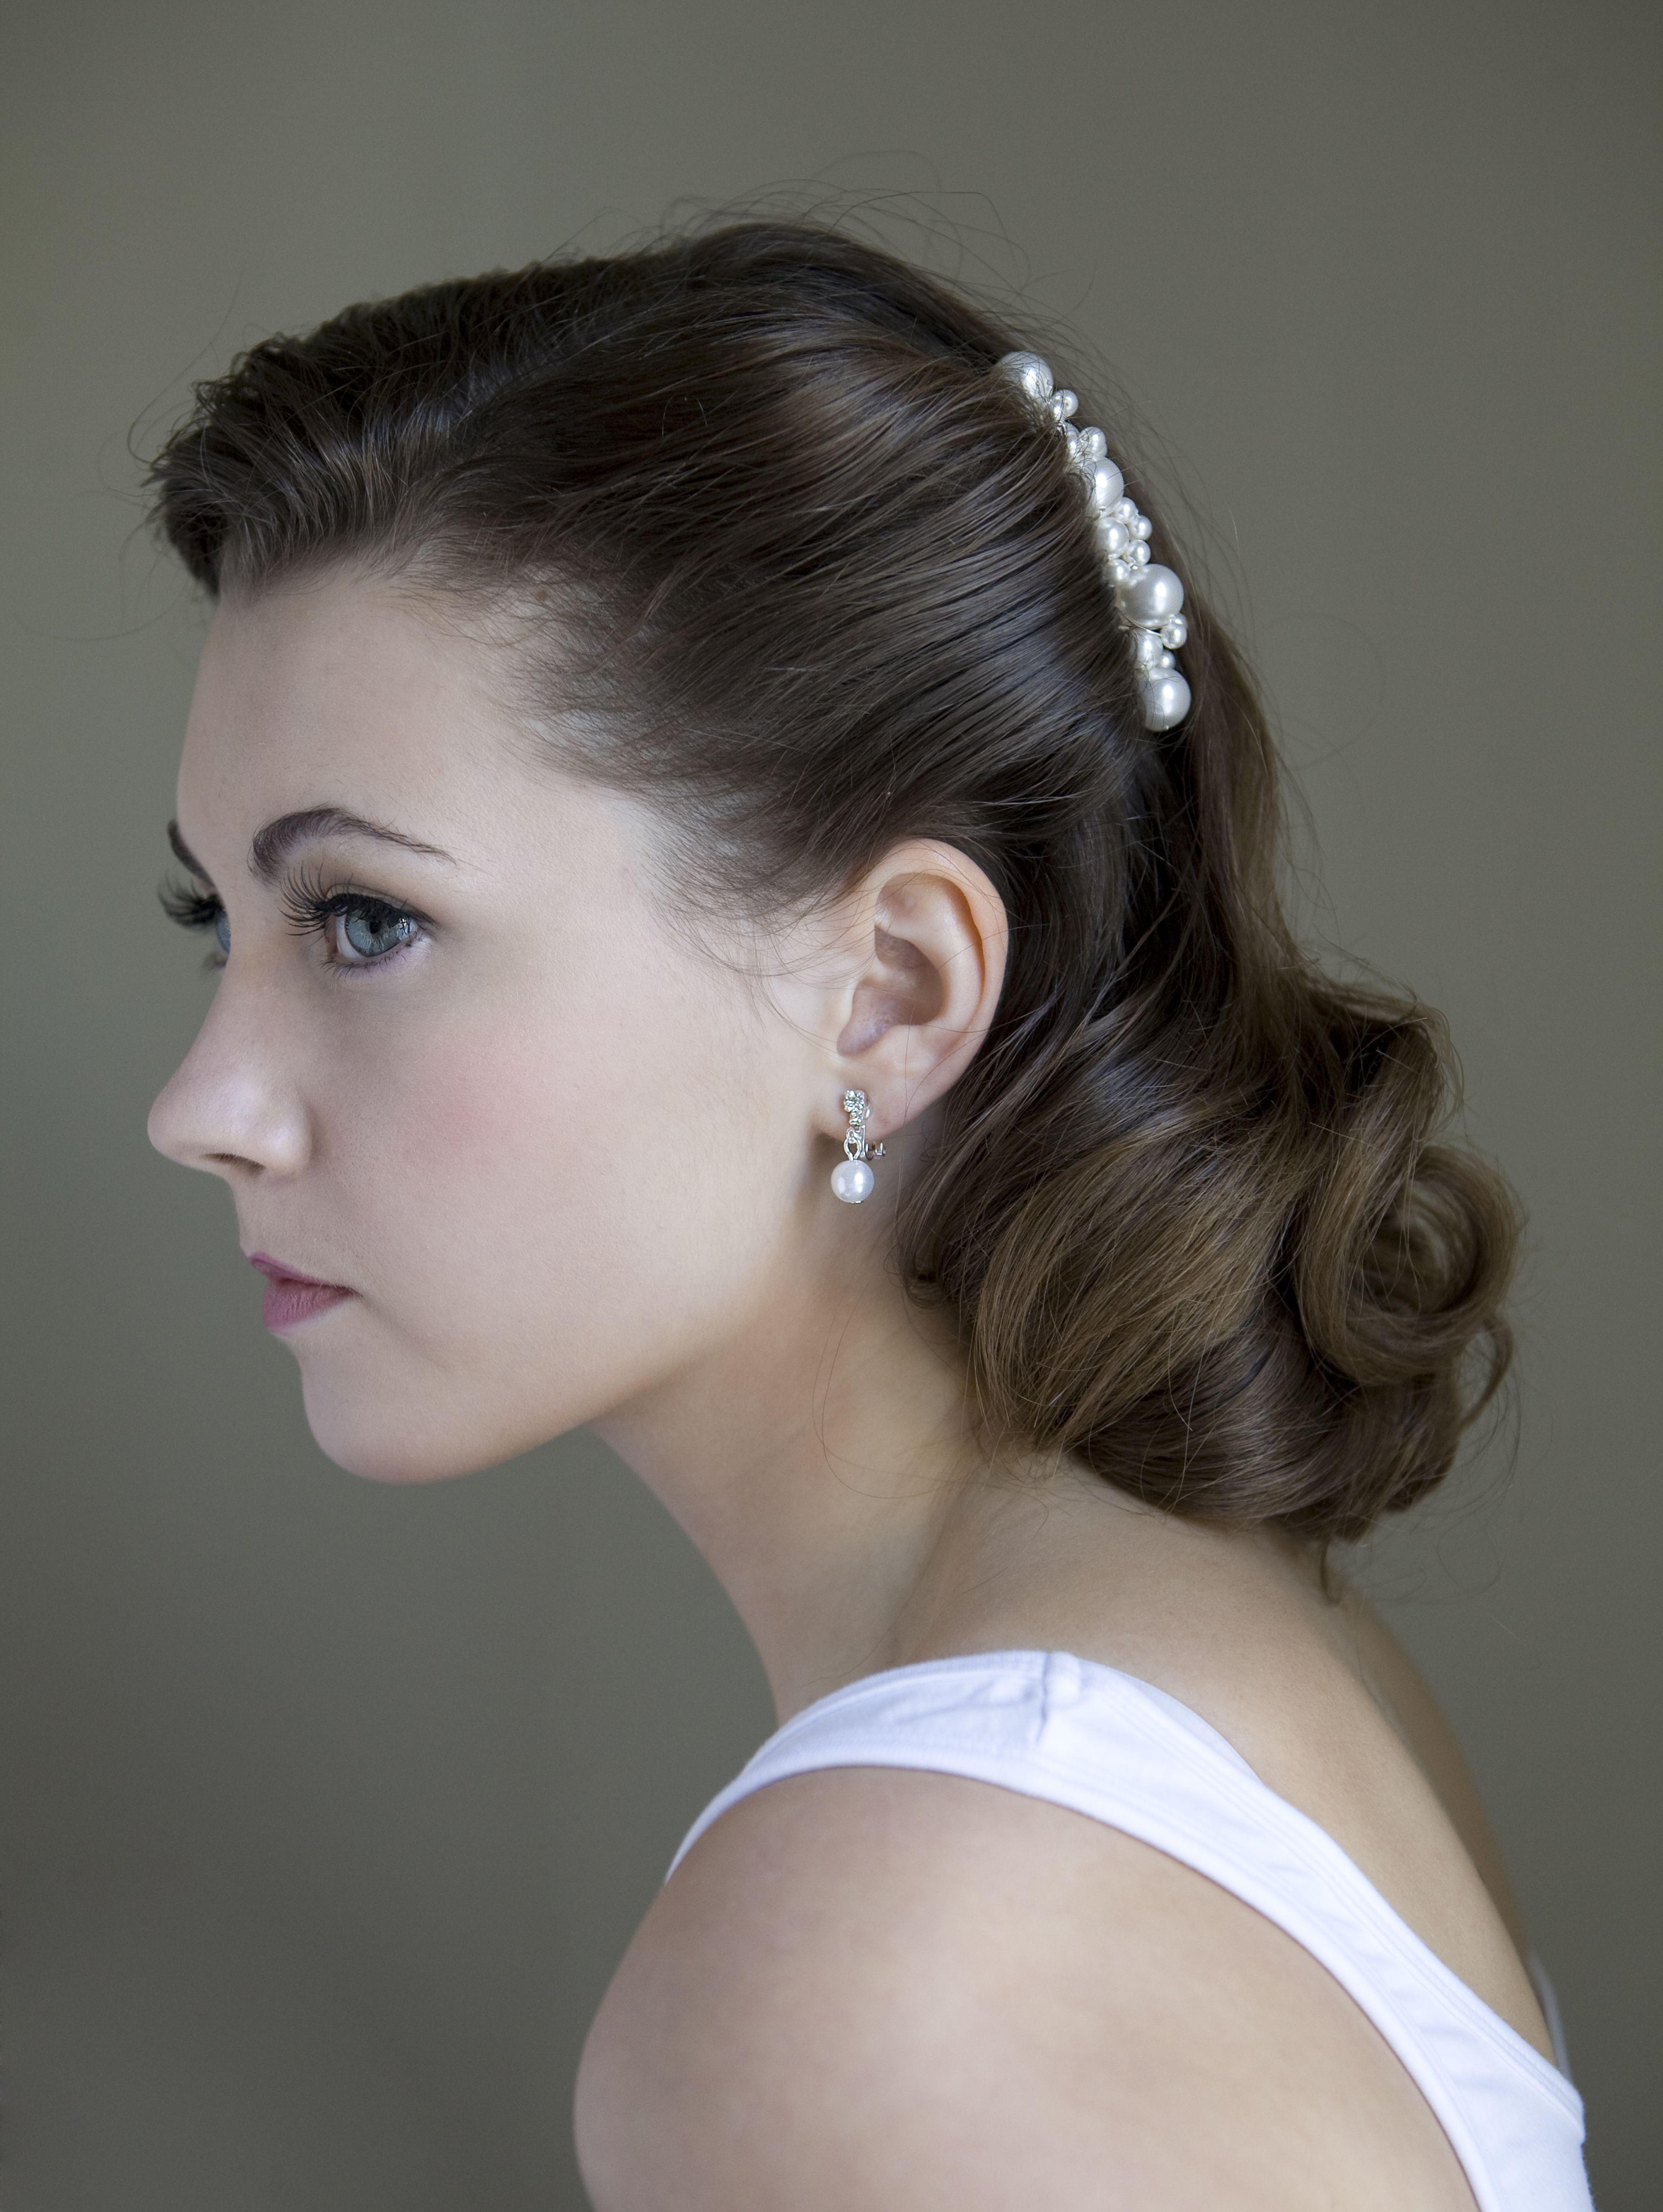 1940s Bridal Hair and Makeup Hair, Makeup and Styling